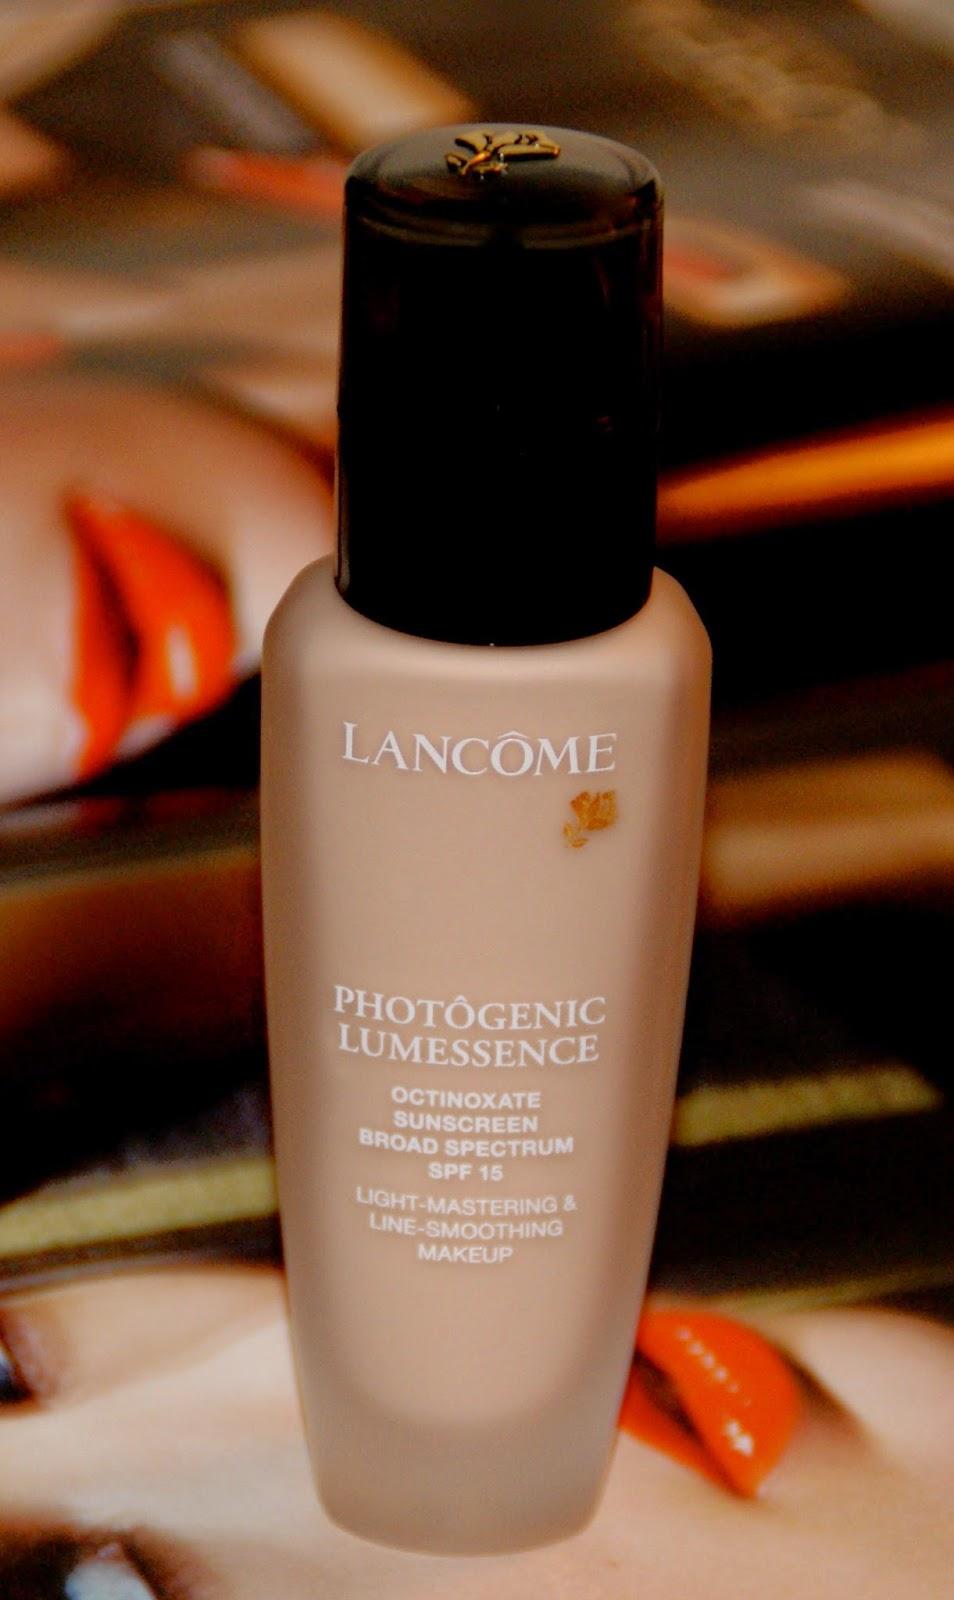 LancomePhotogenicLumessenceLiquidfoundation